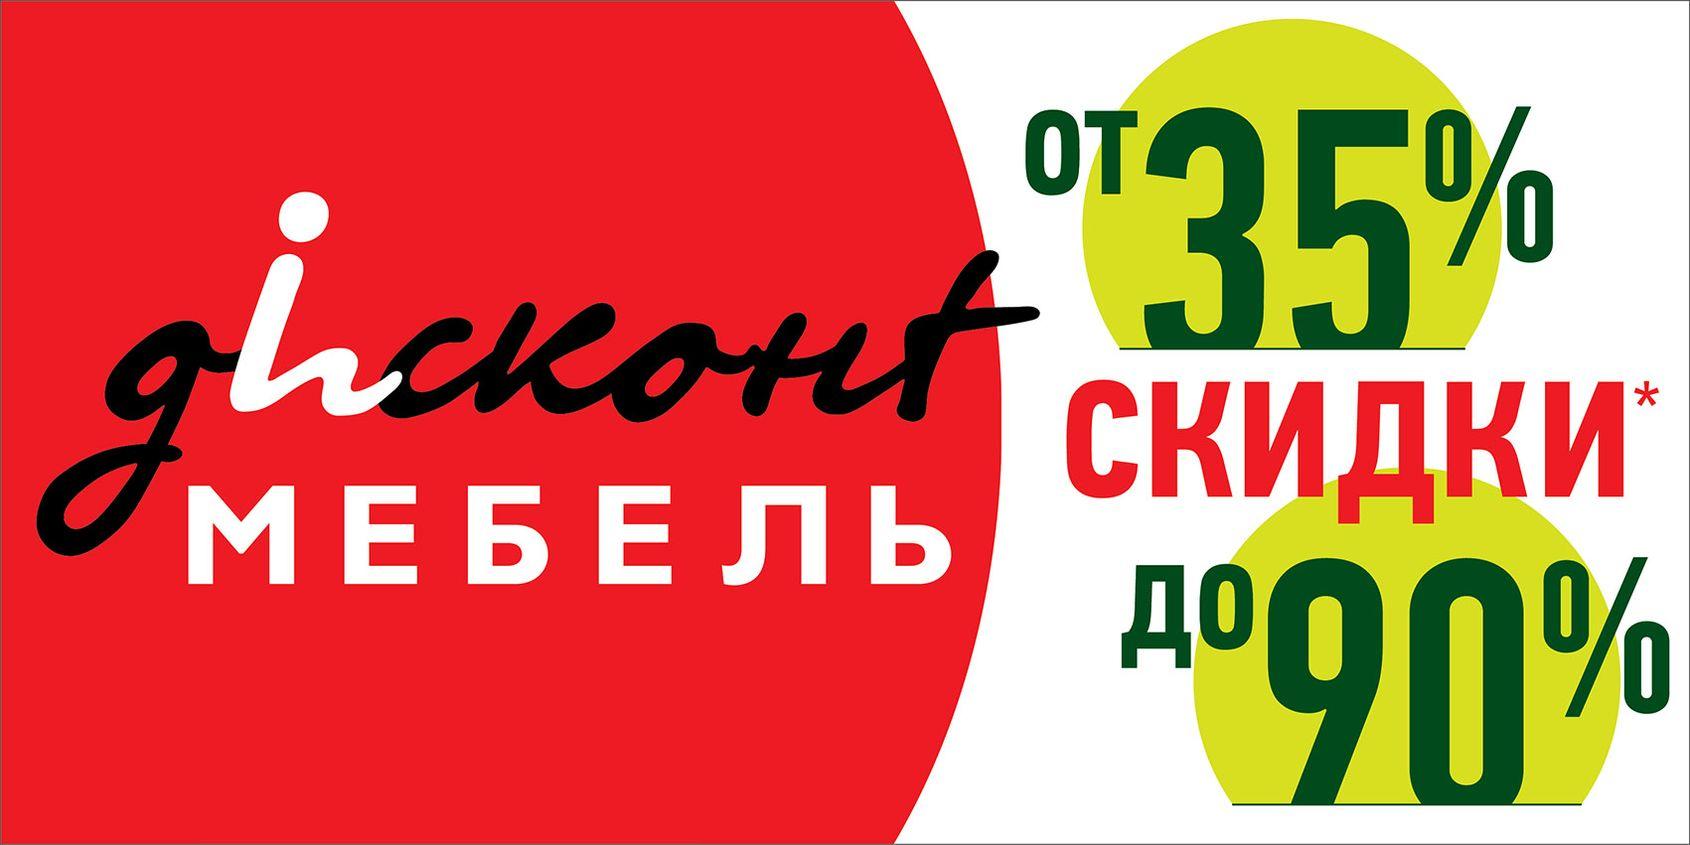 web_Discont_2014-01.jpg